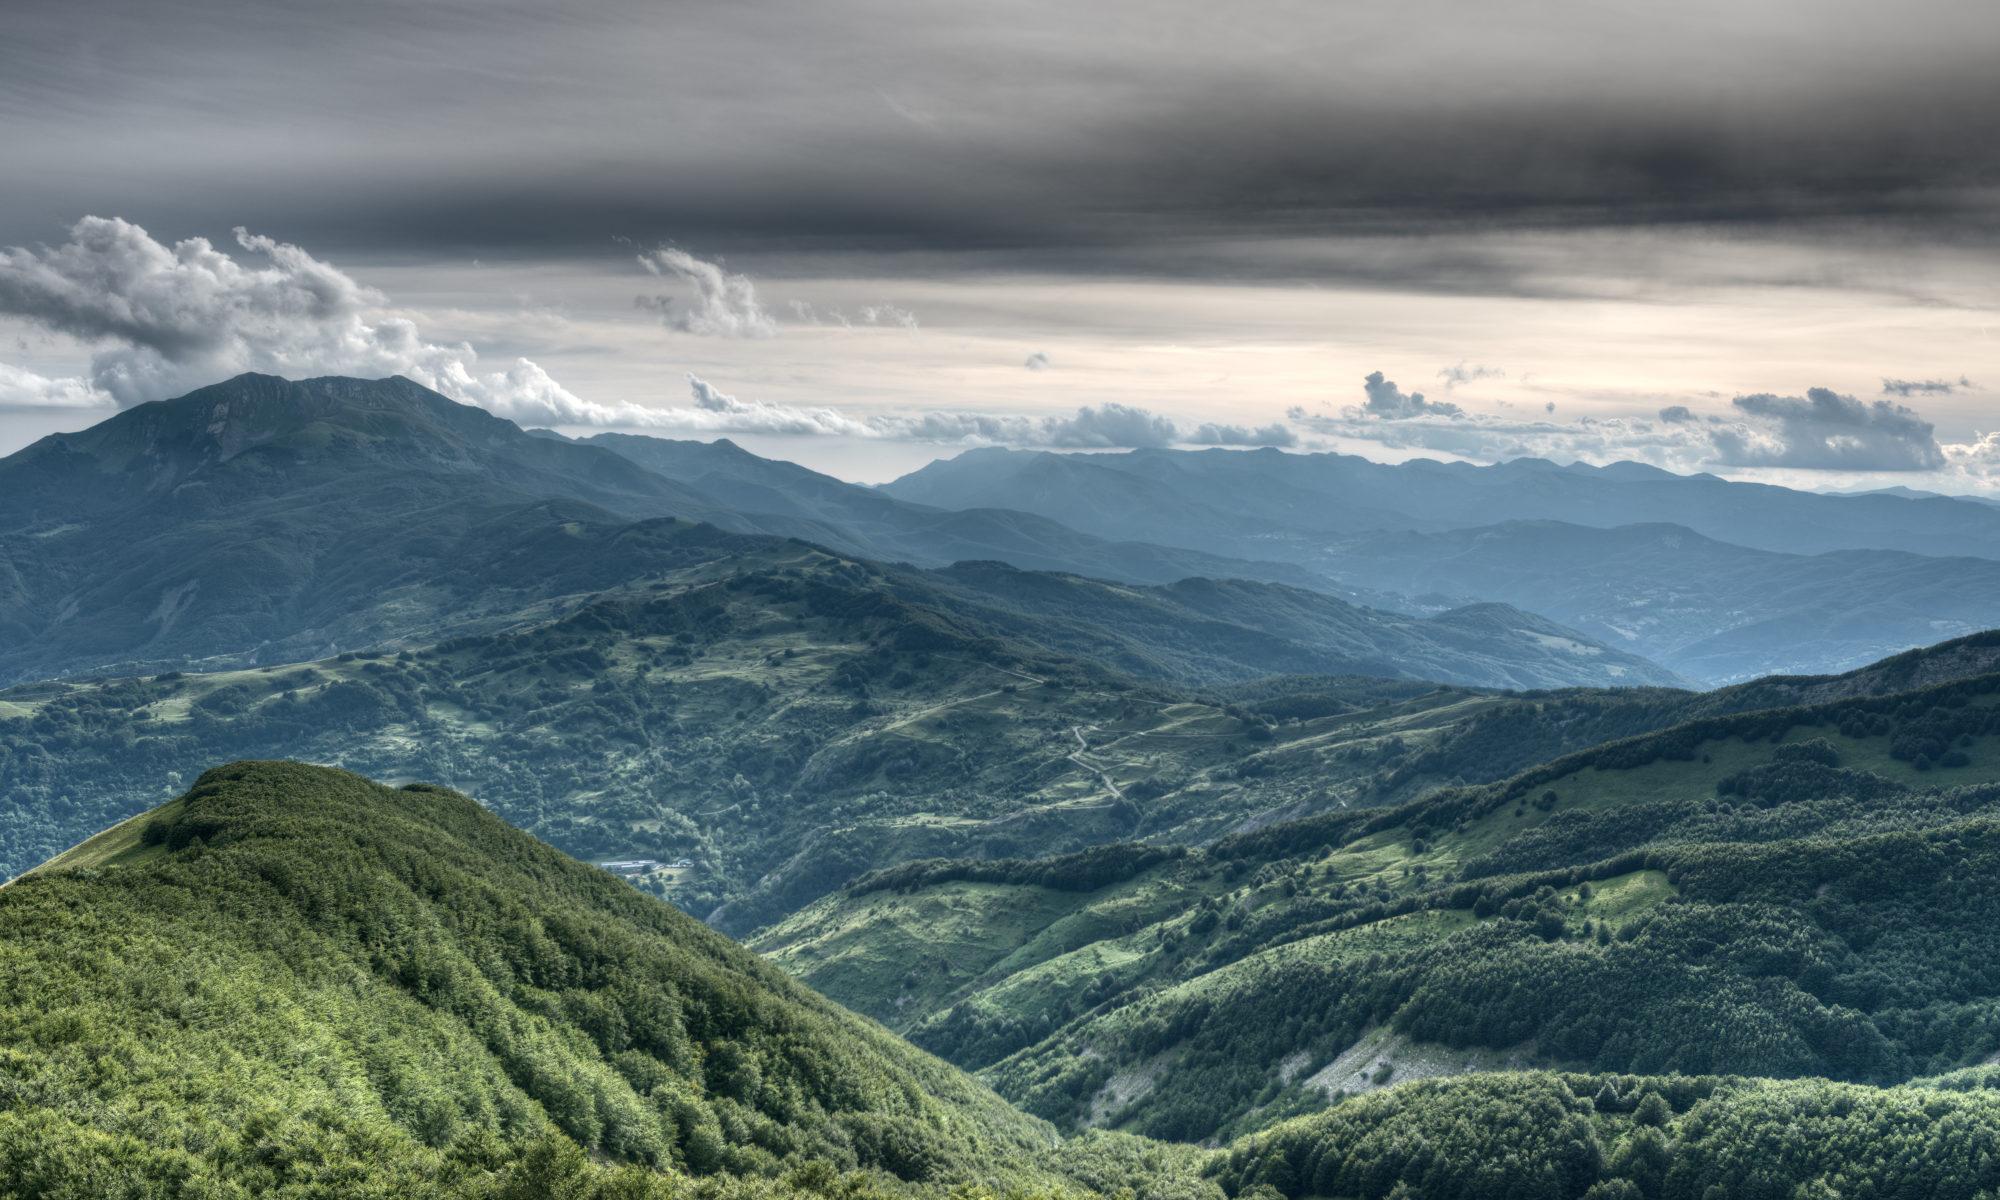 Emilia Romagna Slow | 5 hiking trails to enjoy the Spring